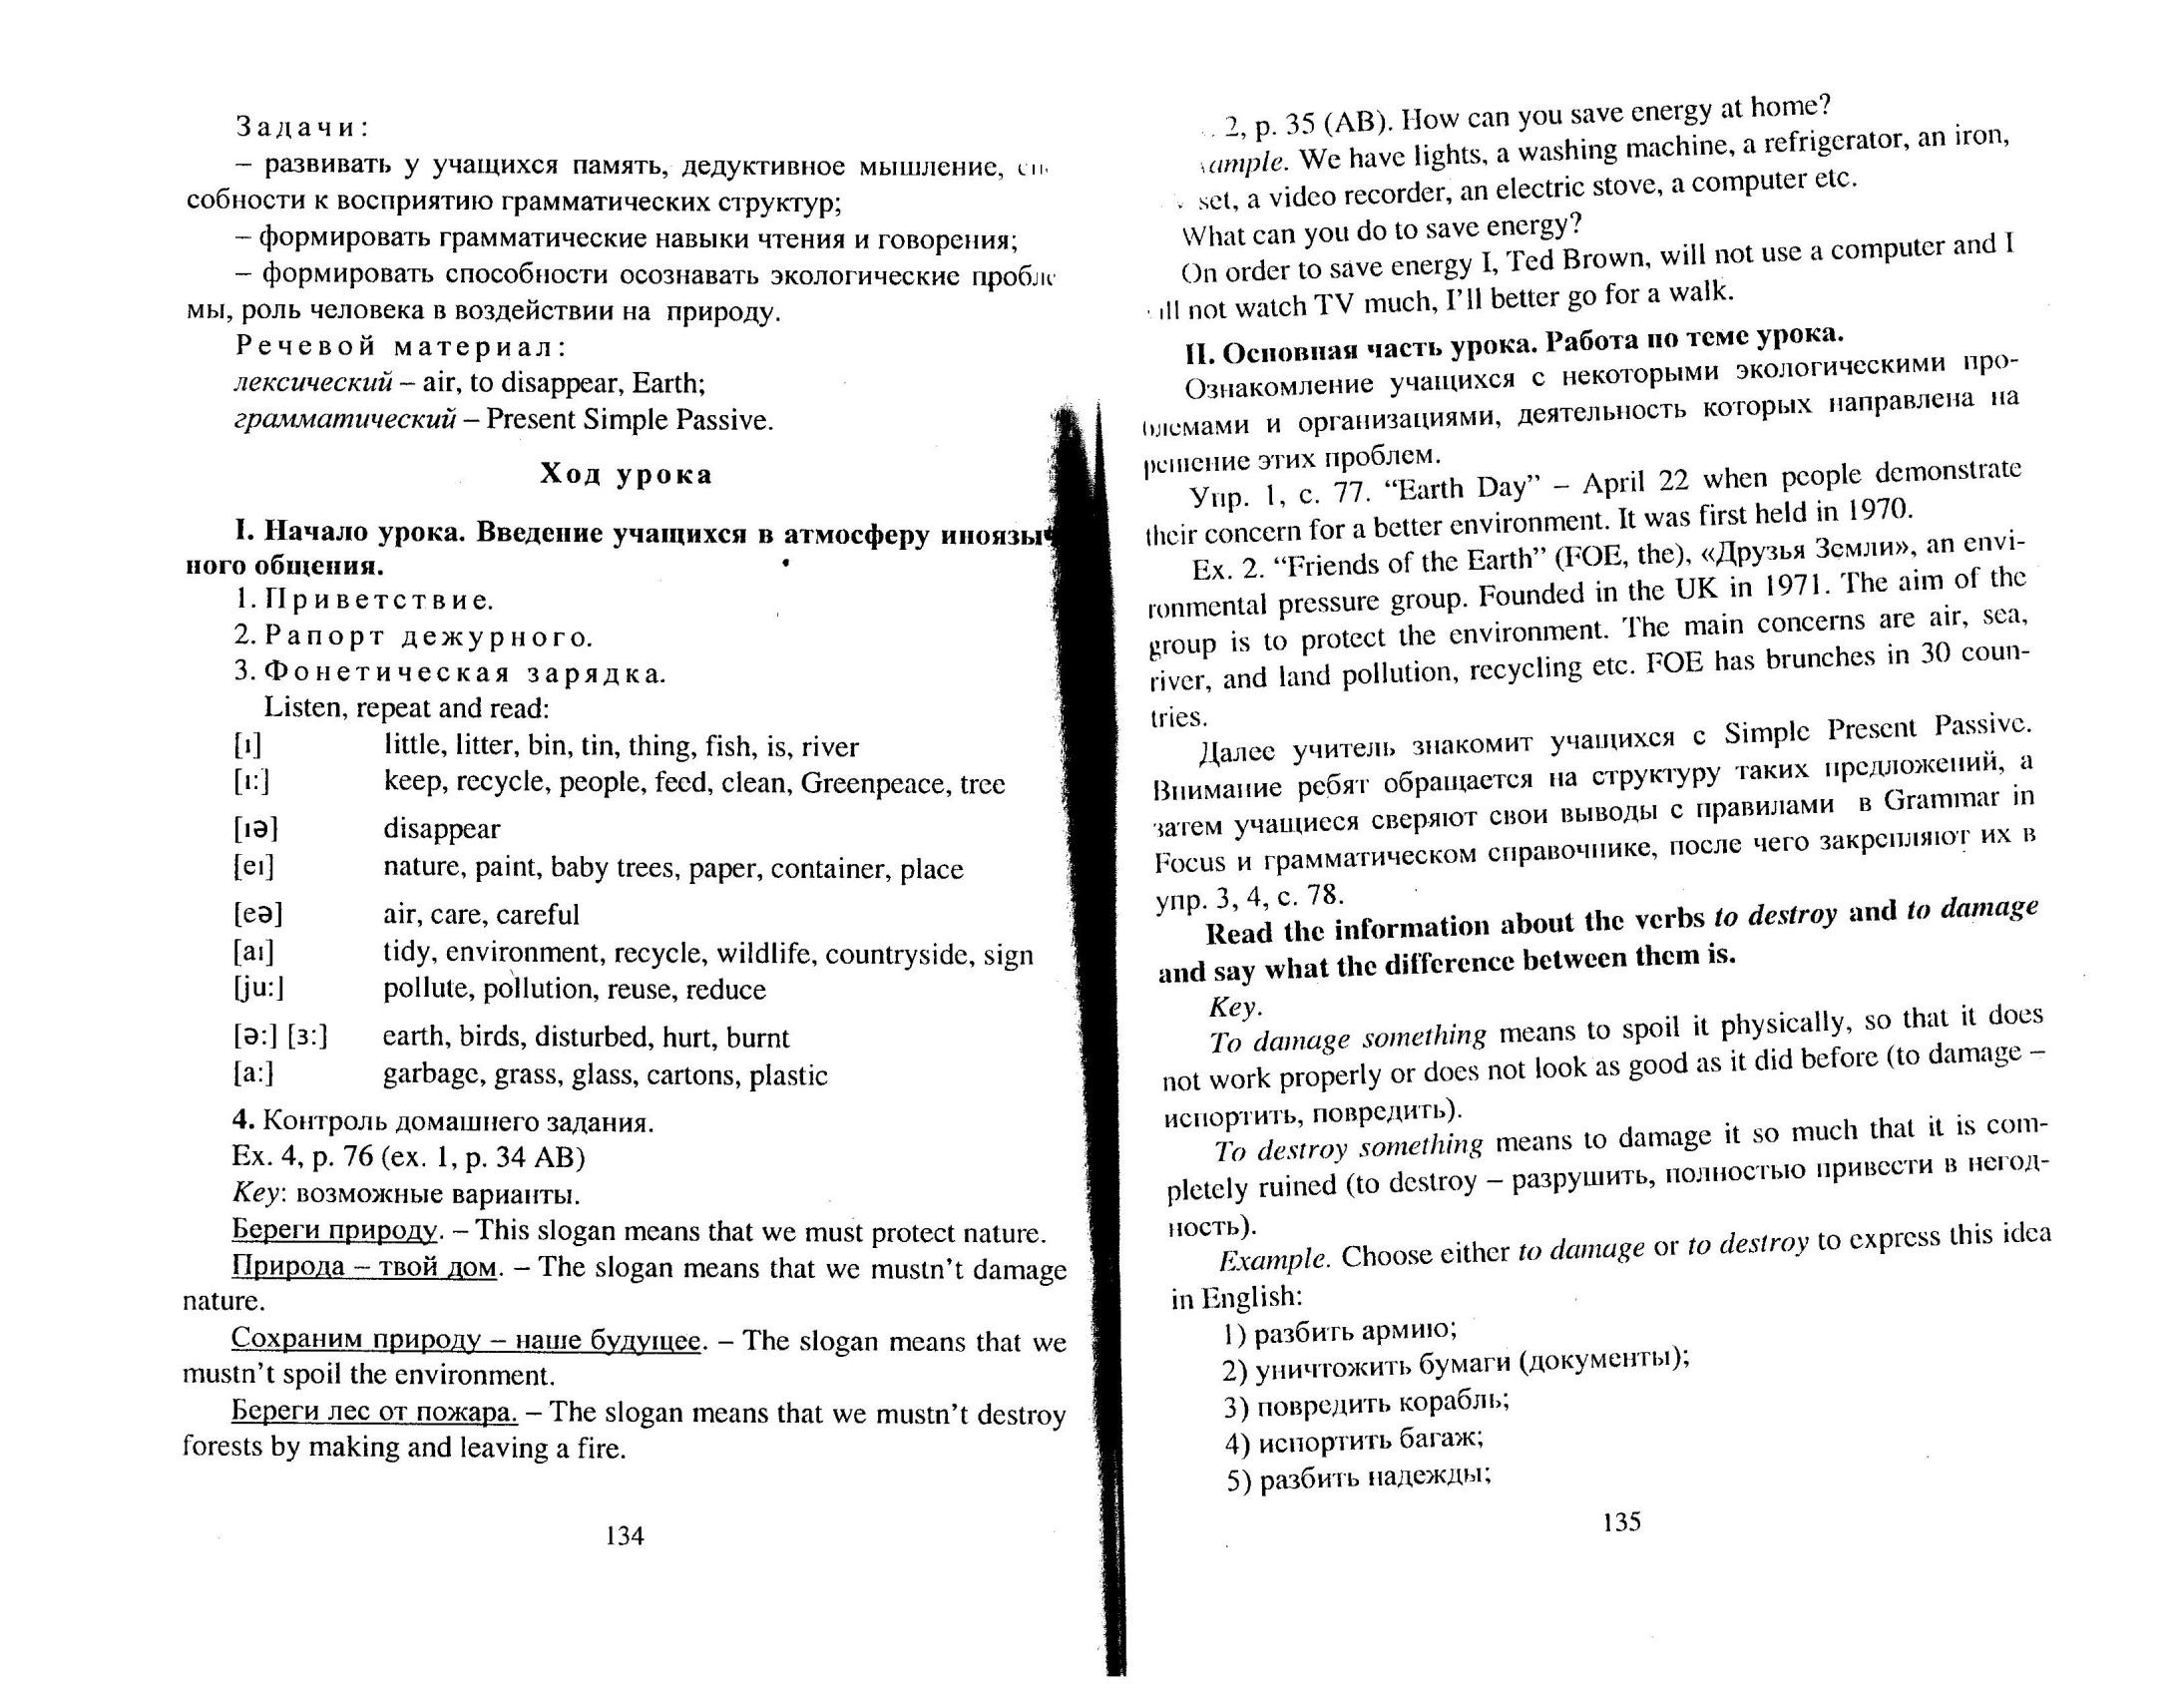 C:\Users\Грузиновская СОШ\Documents\Scanned Documents\Рисунок (1561).jpg